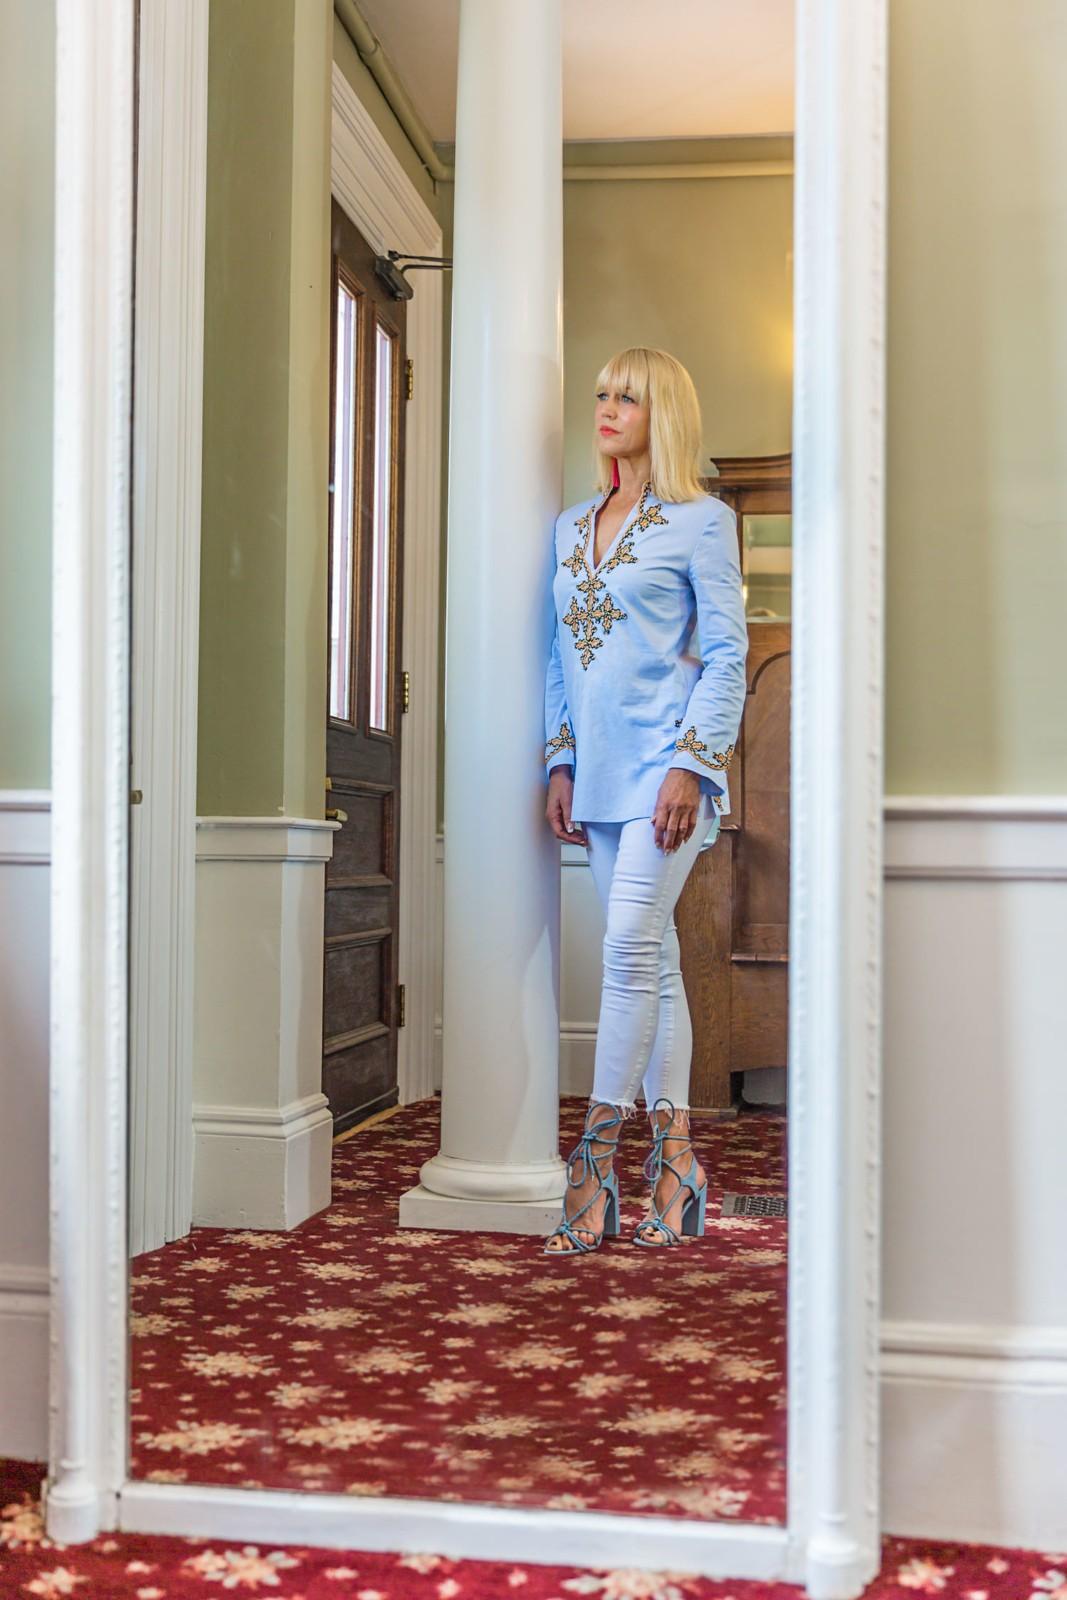 CatherineGraceO Essex Street Inn Lobby Mirror